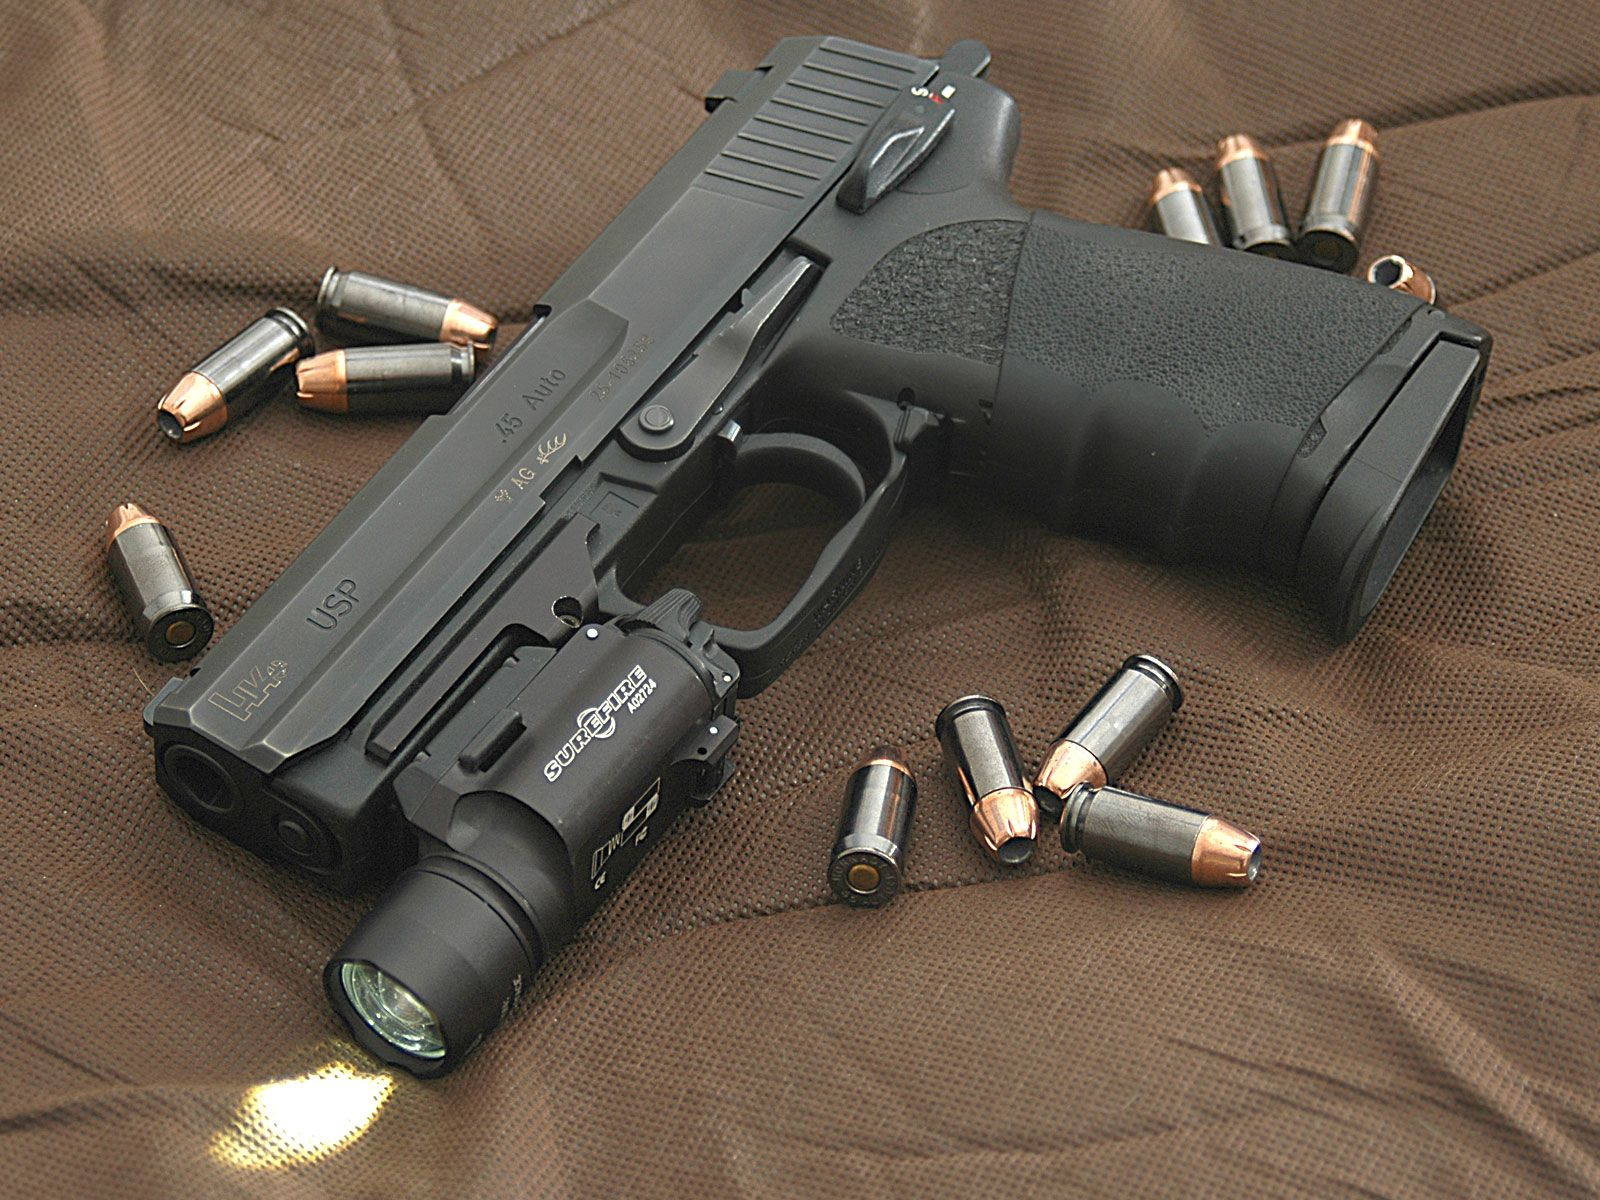 pistols guns weapons Heckler and Koch USP .45ACP hollow point tactical light / 1600x1200 Wallpaper